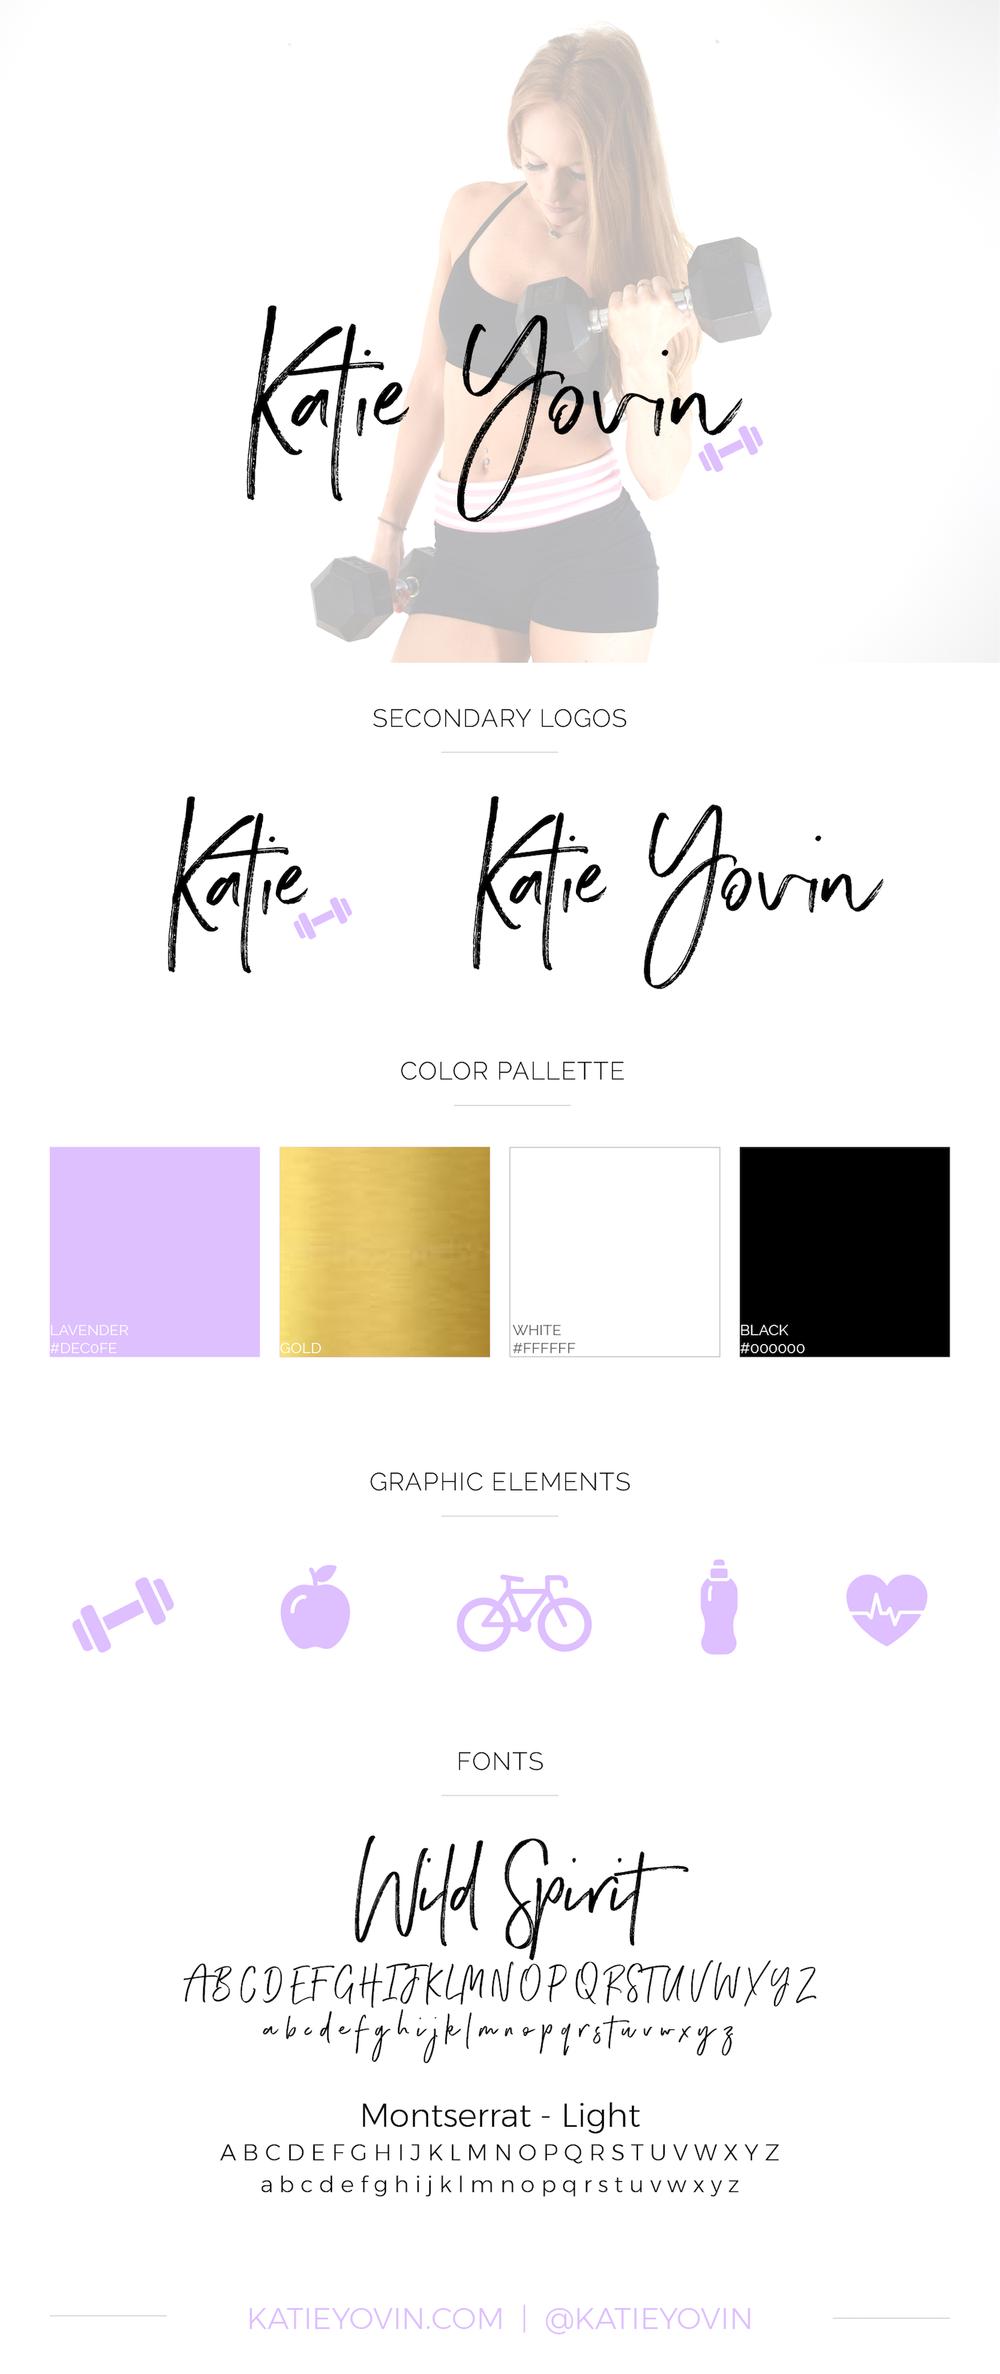 KatieYovin_Styleguide2.png